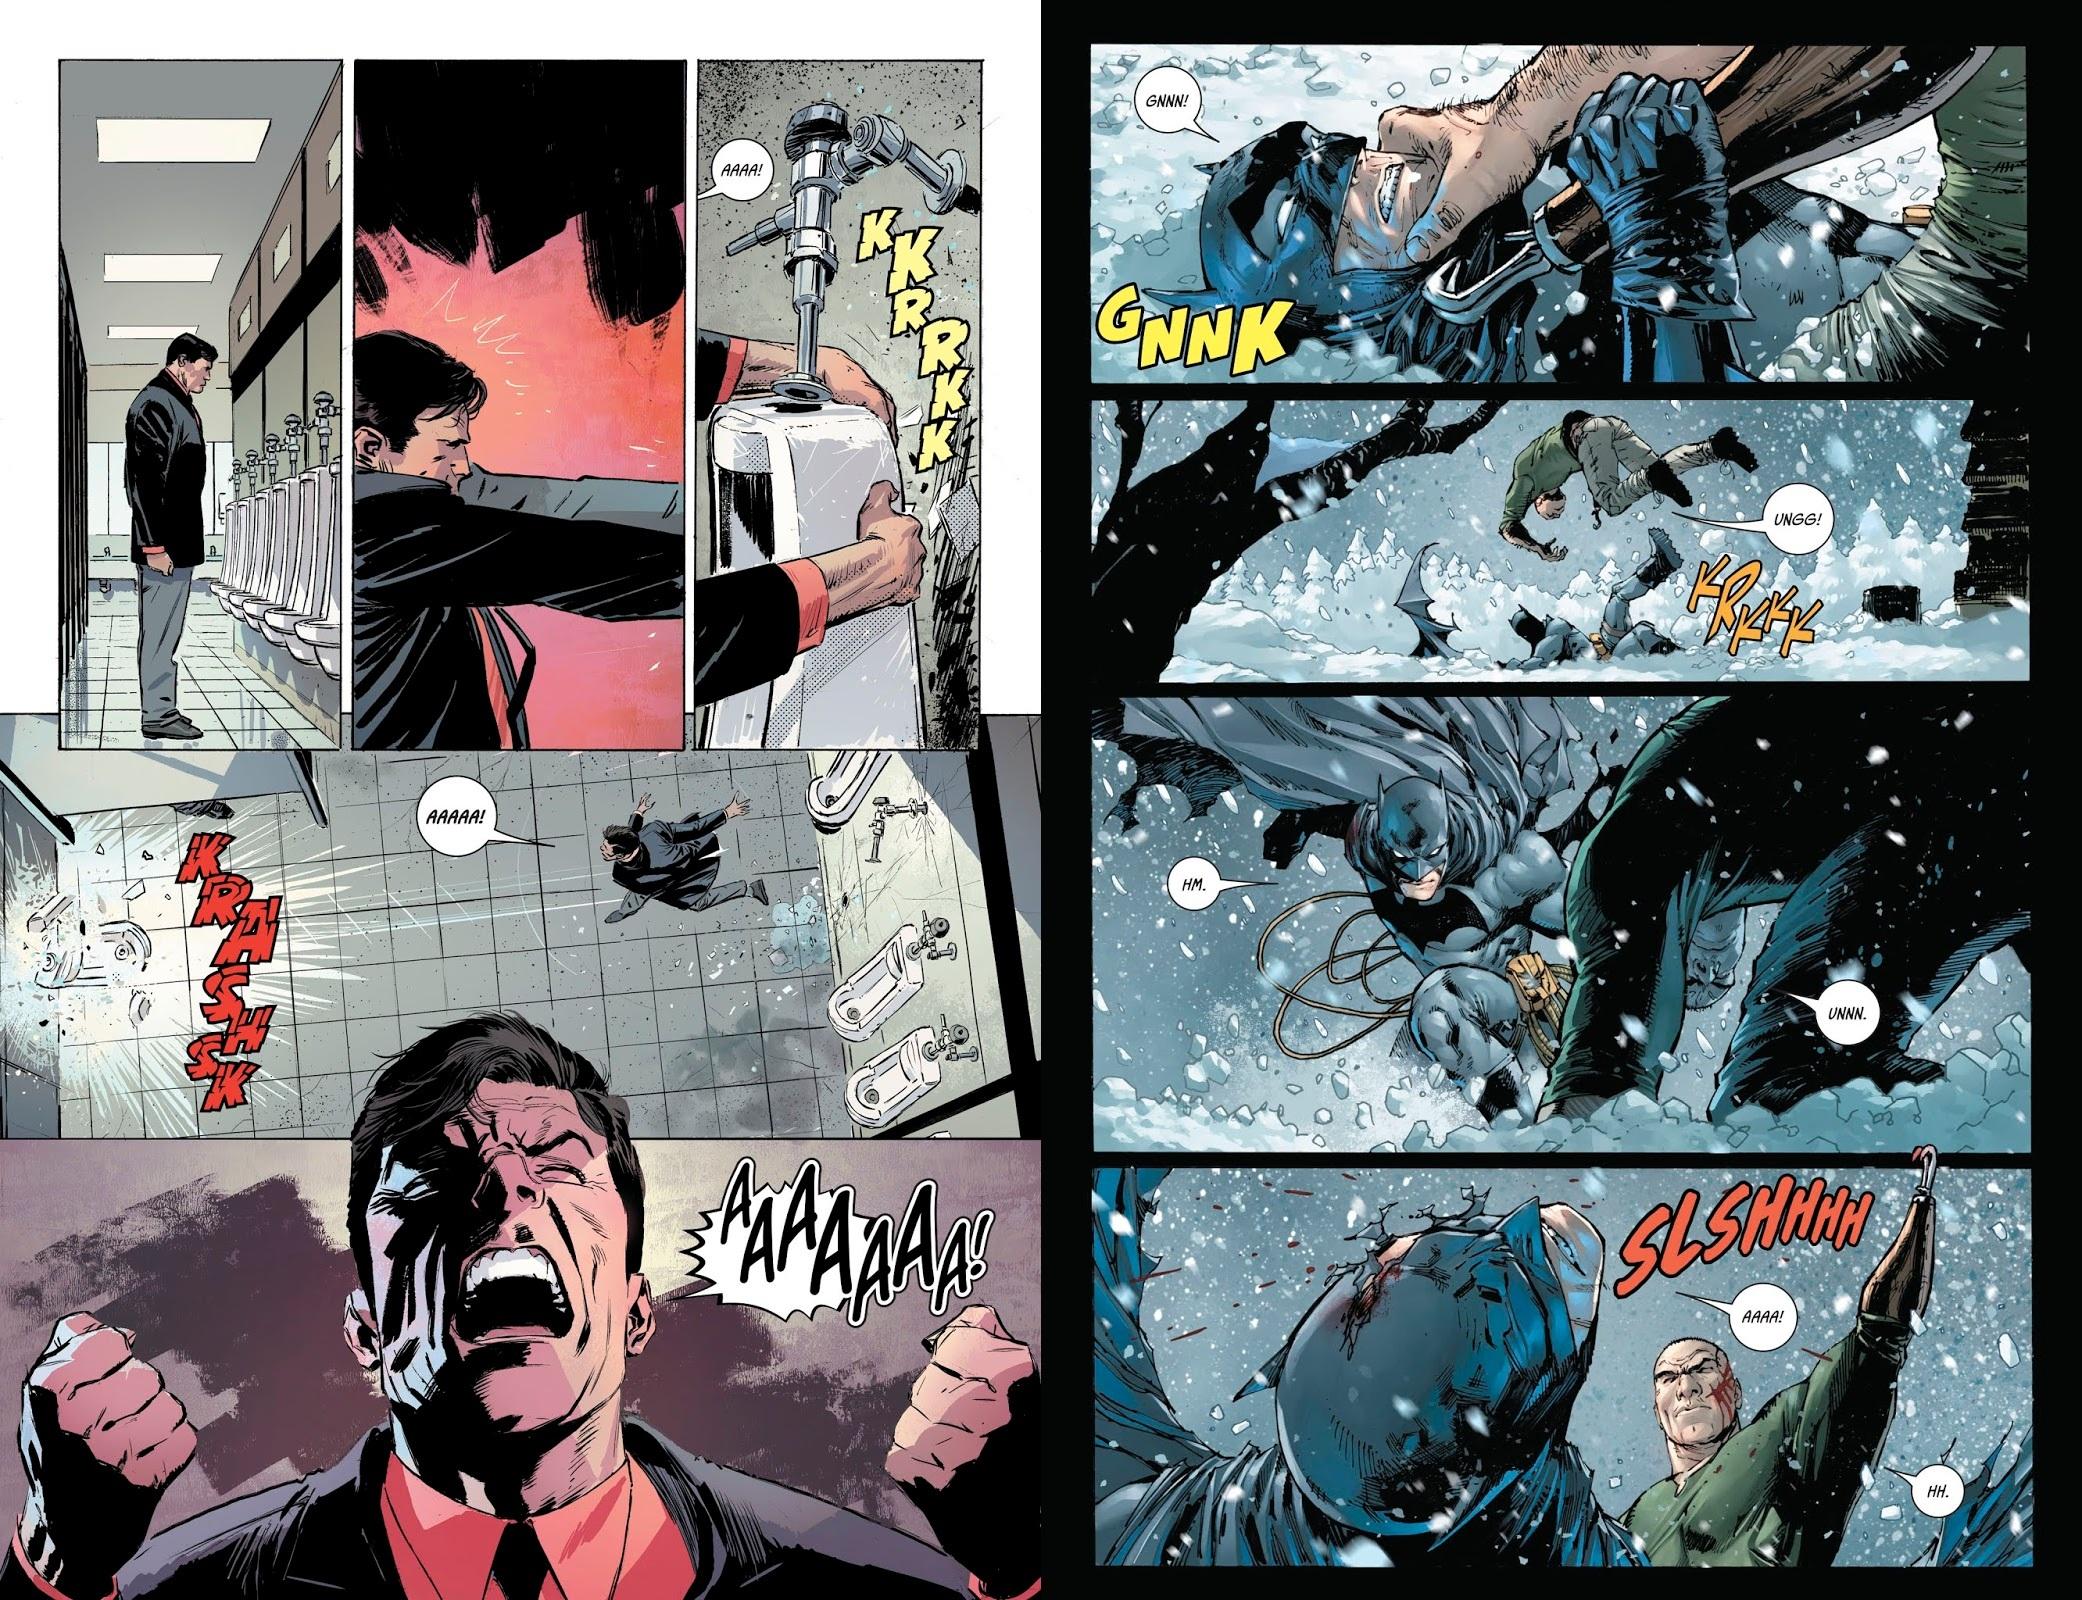 Batman Rebirth 8 Cold Days review